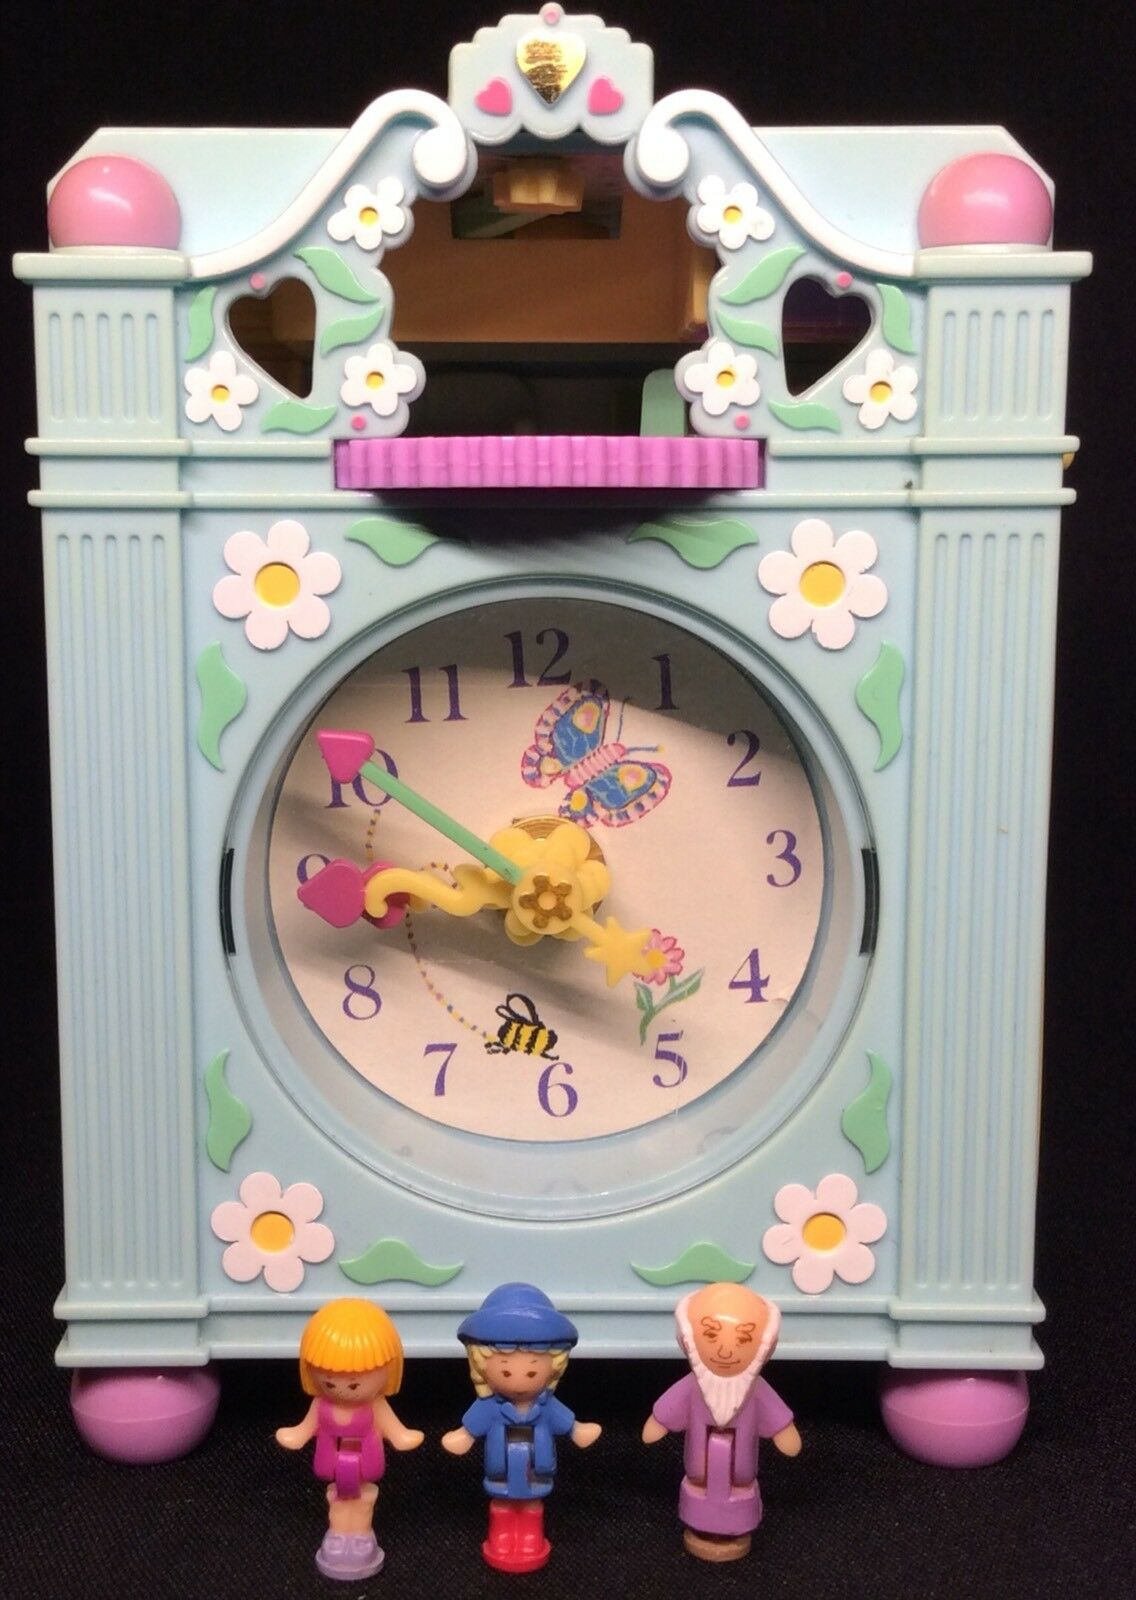 Polly Pocket Mini  1991-Polly Pocket Funtime Clock Playset 1.1